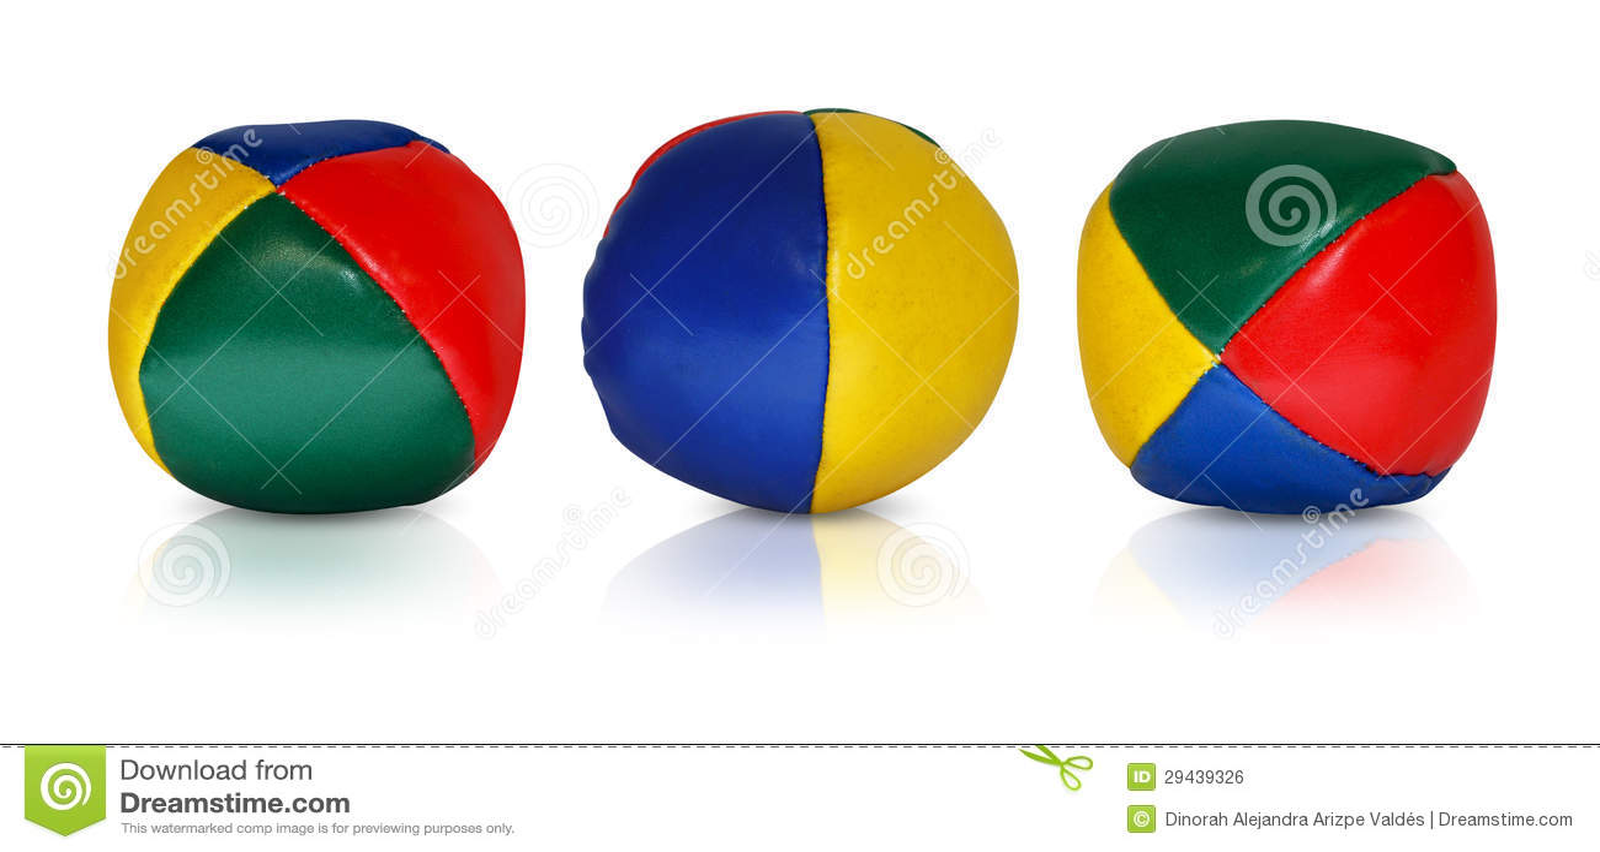 Bolas del juglar que reflejan